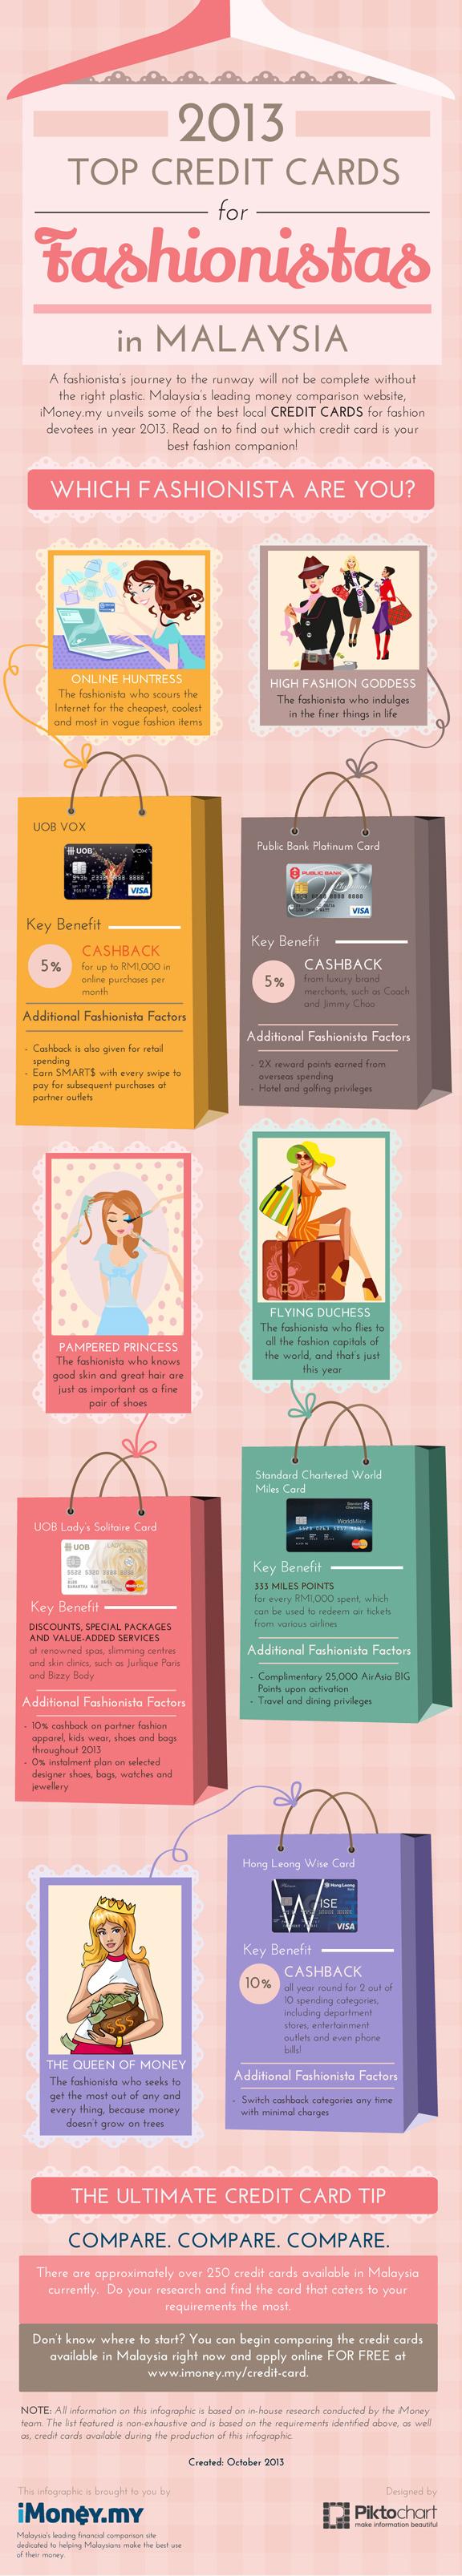 Imoney Fashionistas Infographic 1